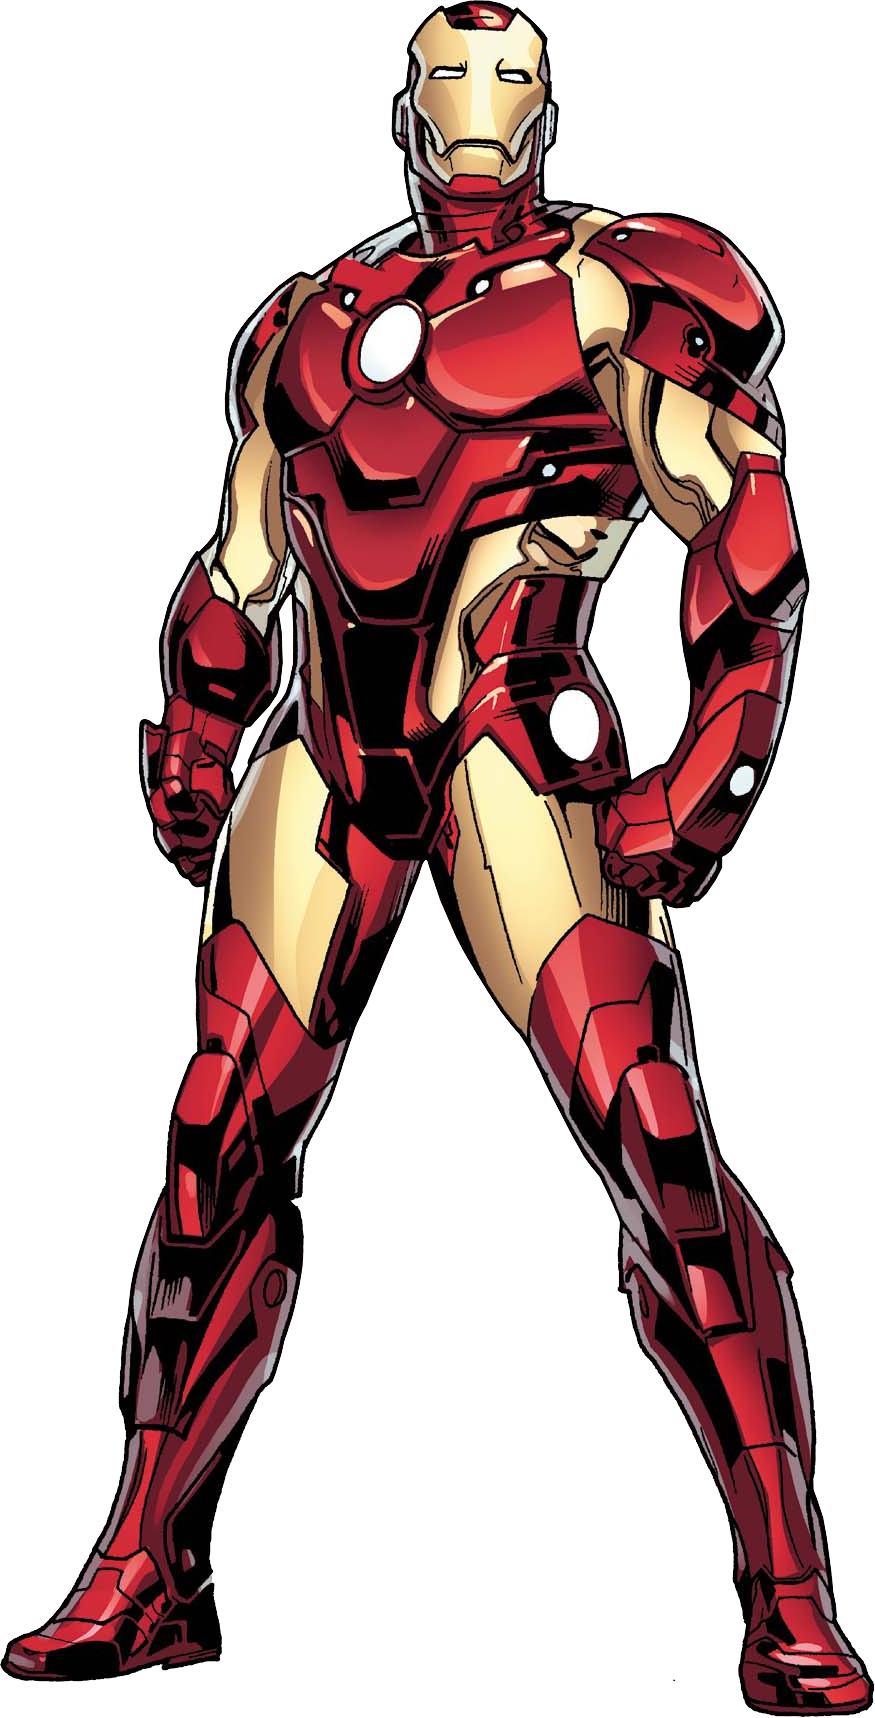 Ironman PNG Image Супергерои, Мстители, Железный человек